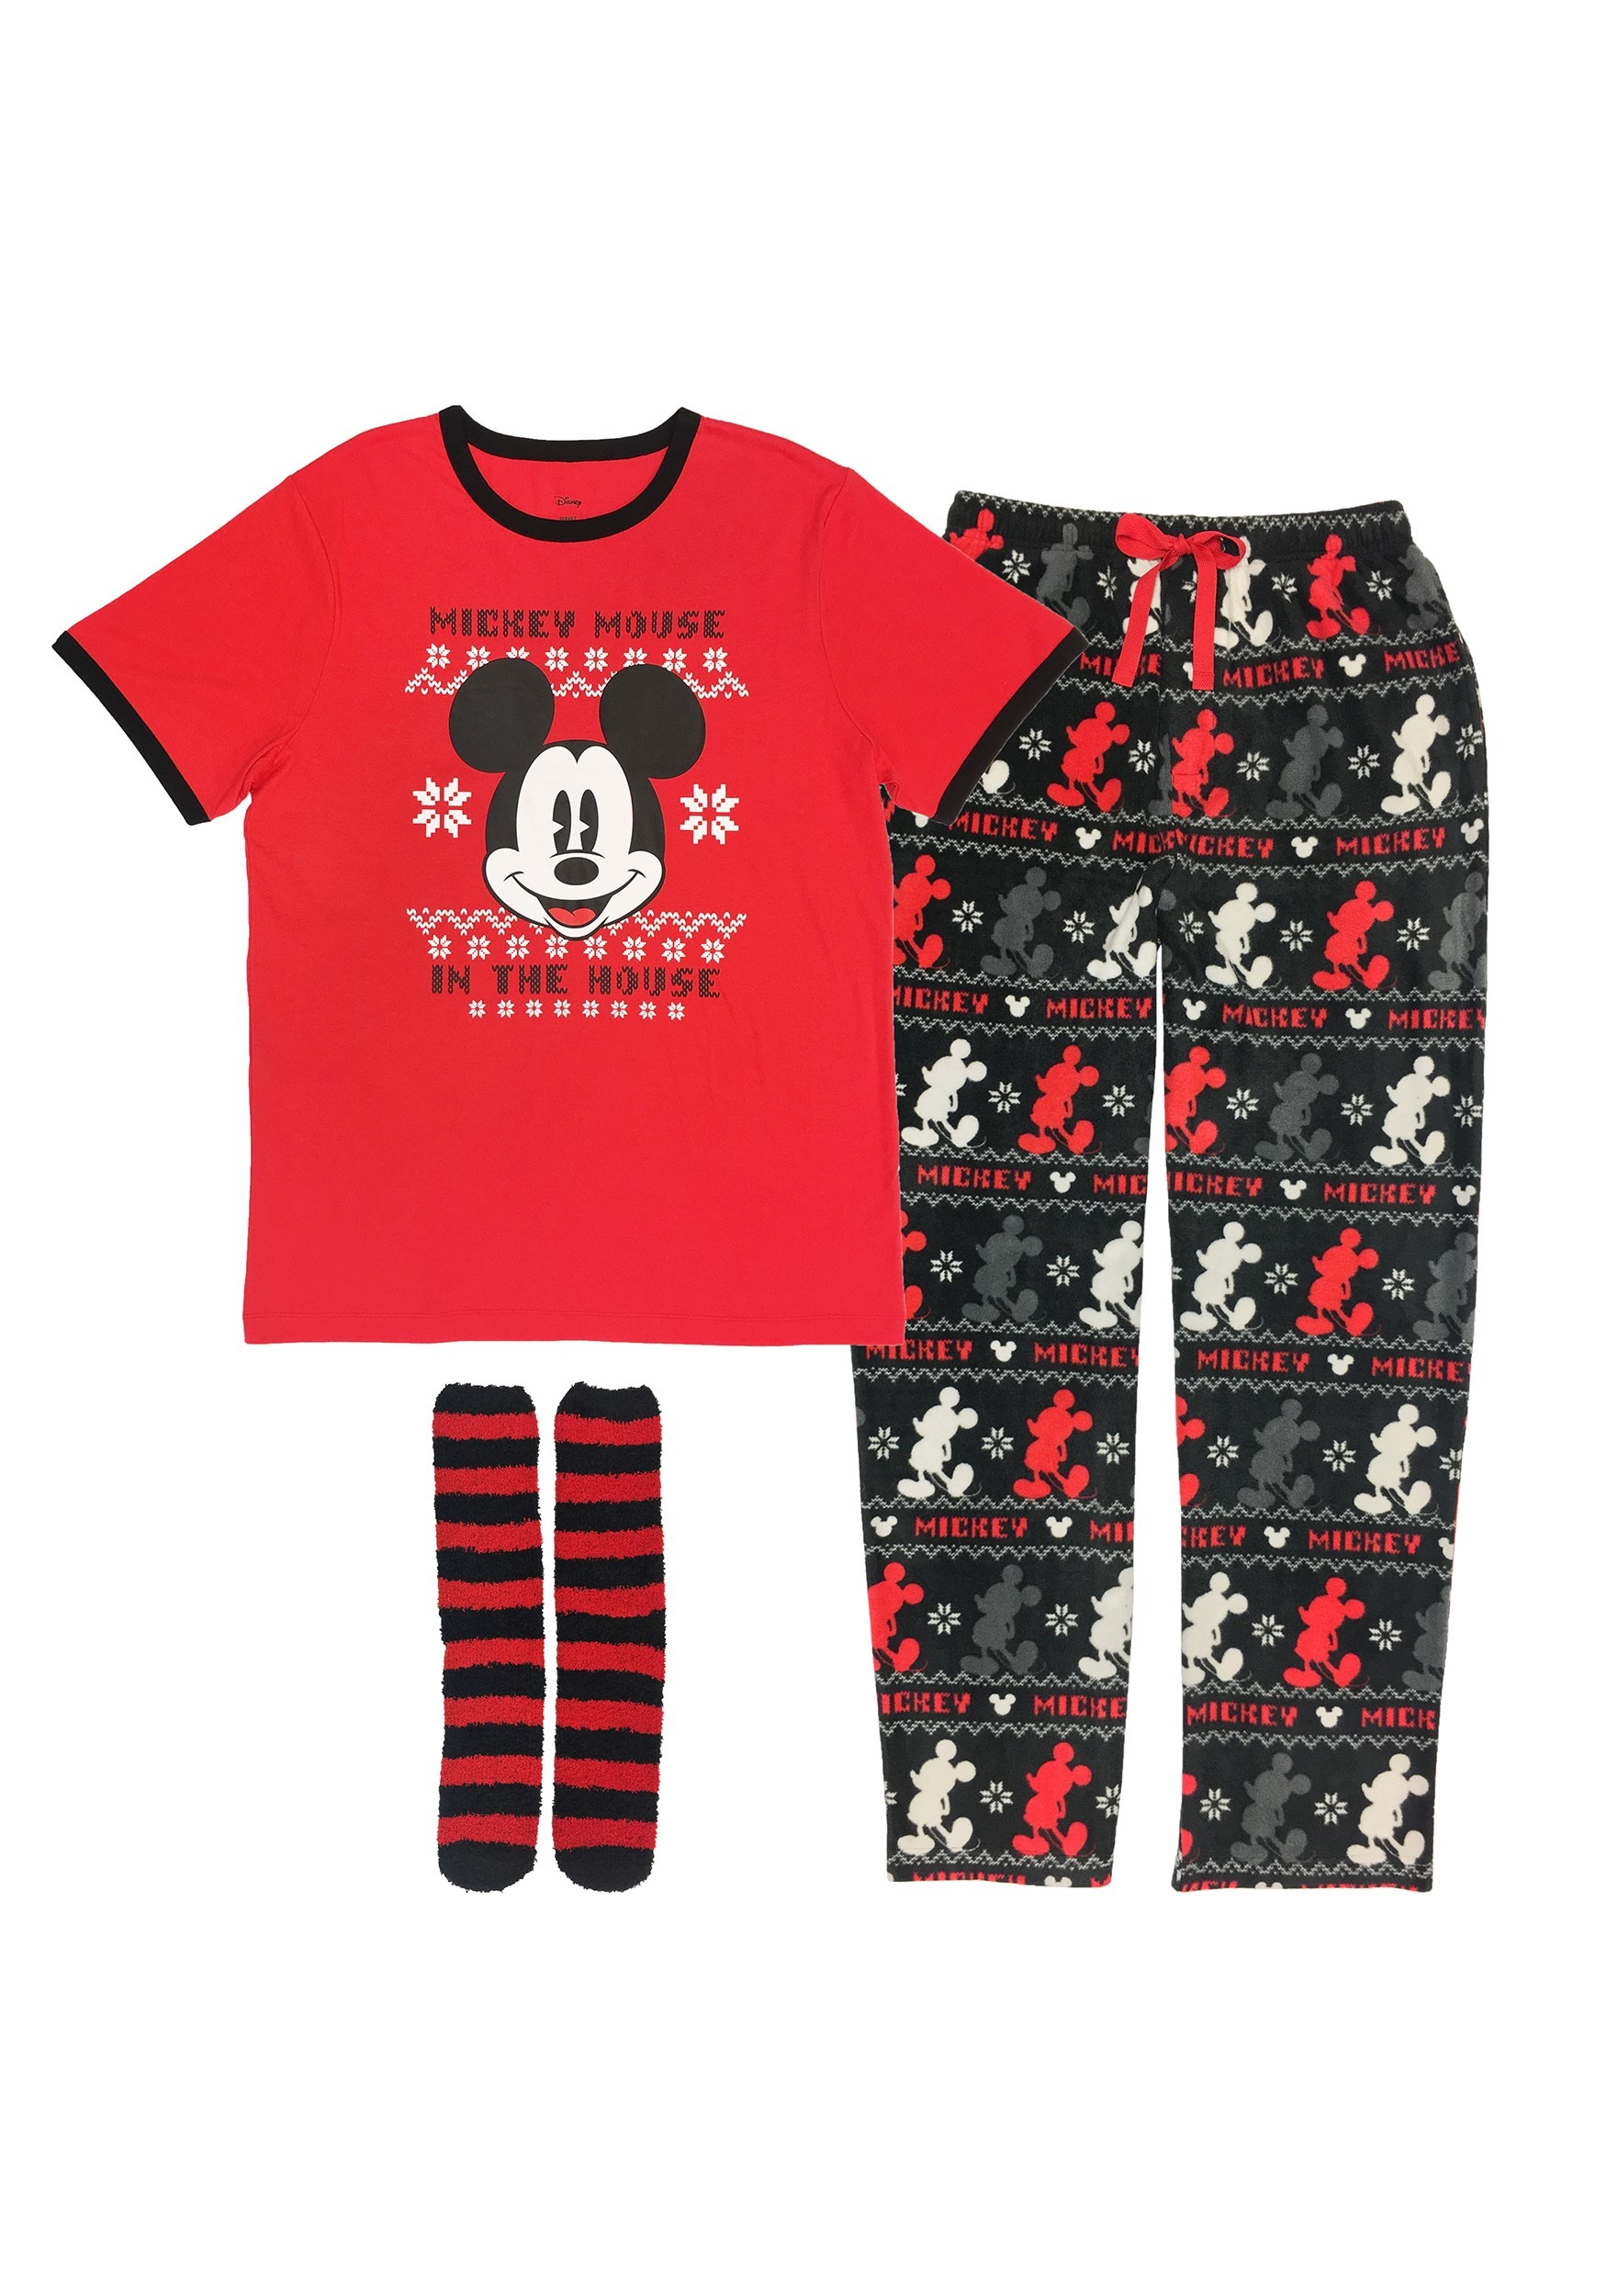 Mens Mickey Mouse Fair Isle Shirt, Plush Pants and Socks Set